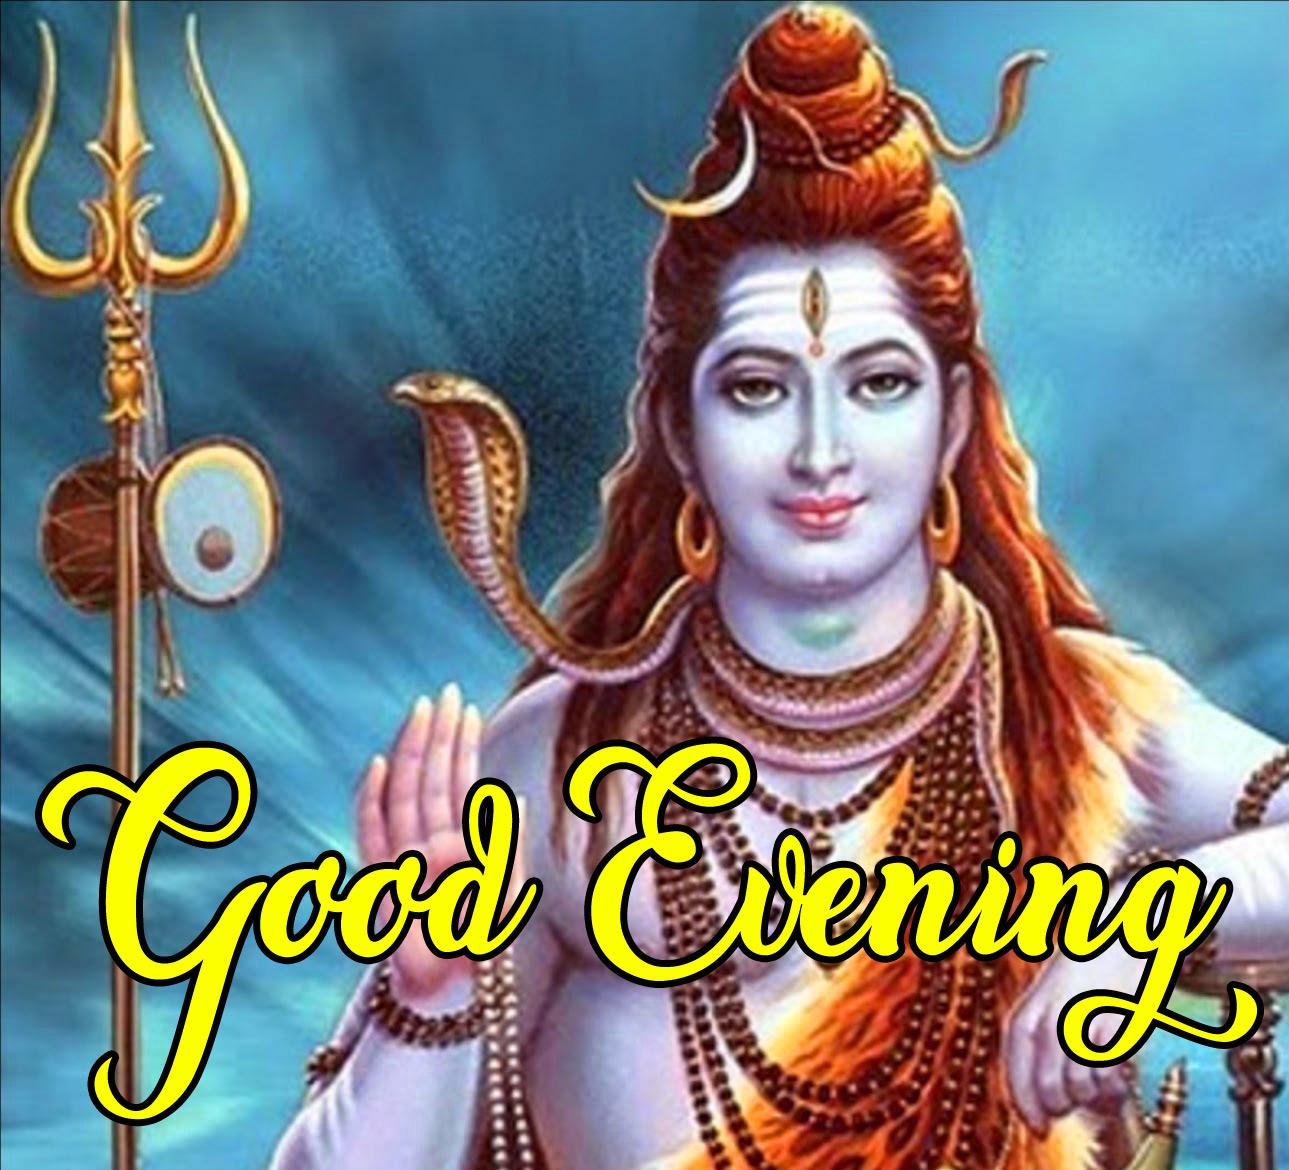 god good evening Images 16